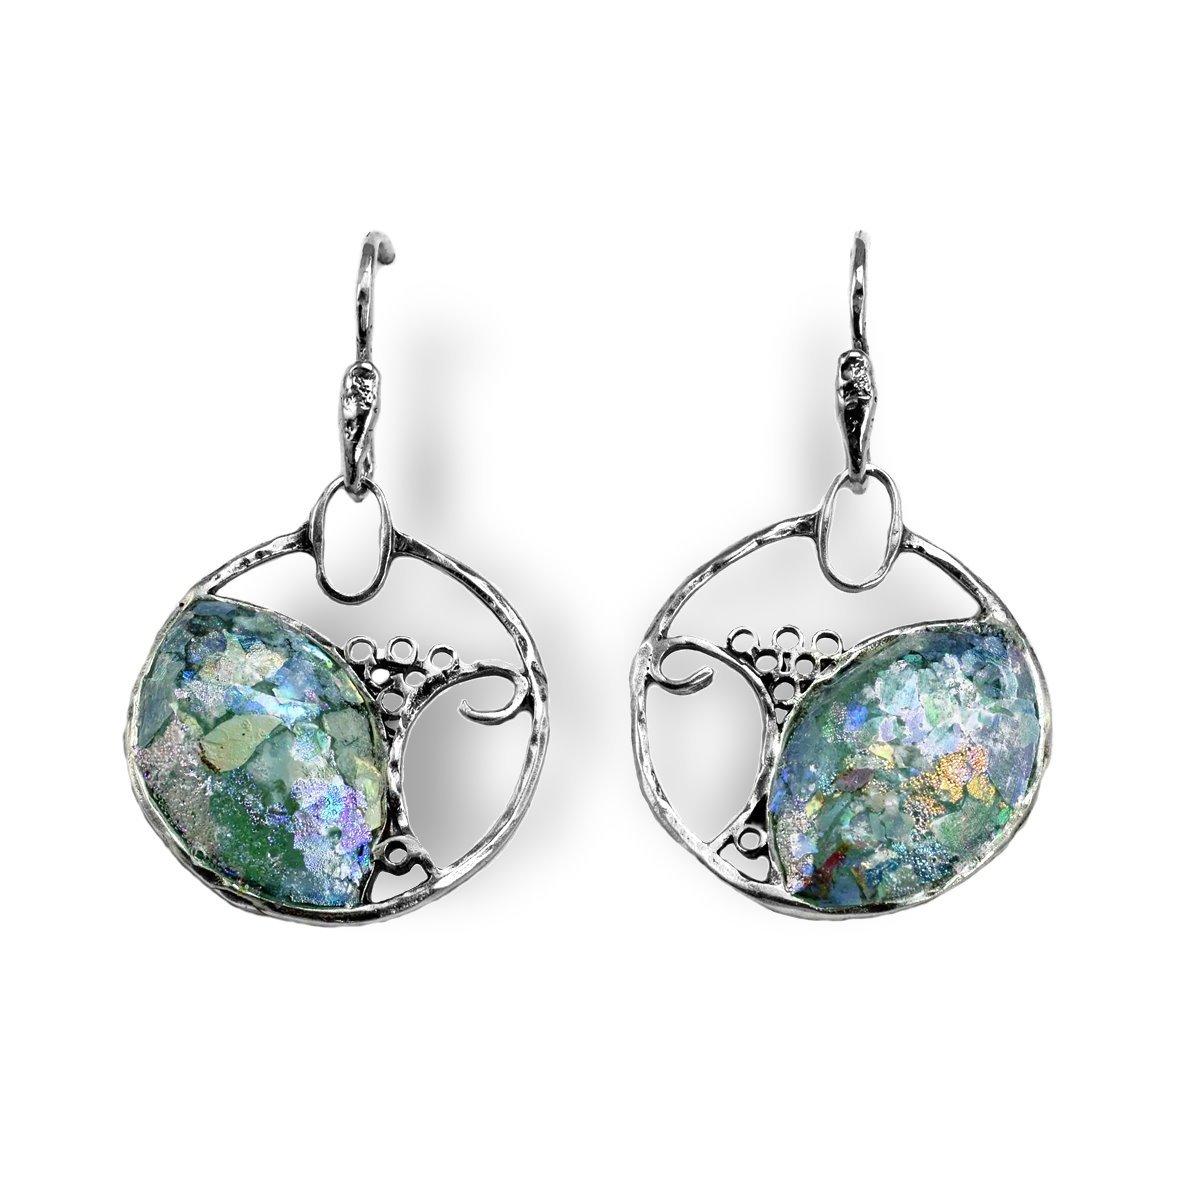 Ancient Roman Glass Earrings Tree Design Sterling Silver Handmade in Israel by AzureBella Jewelry